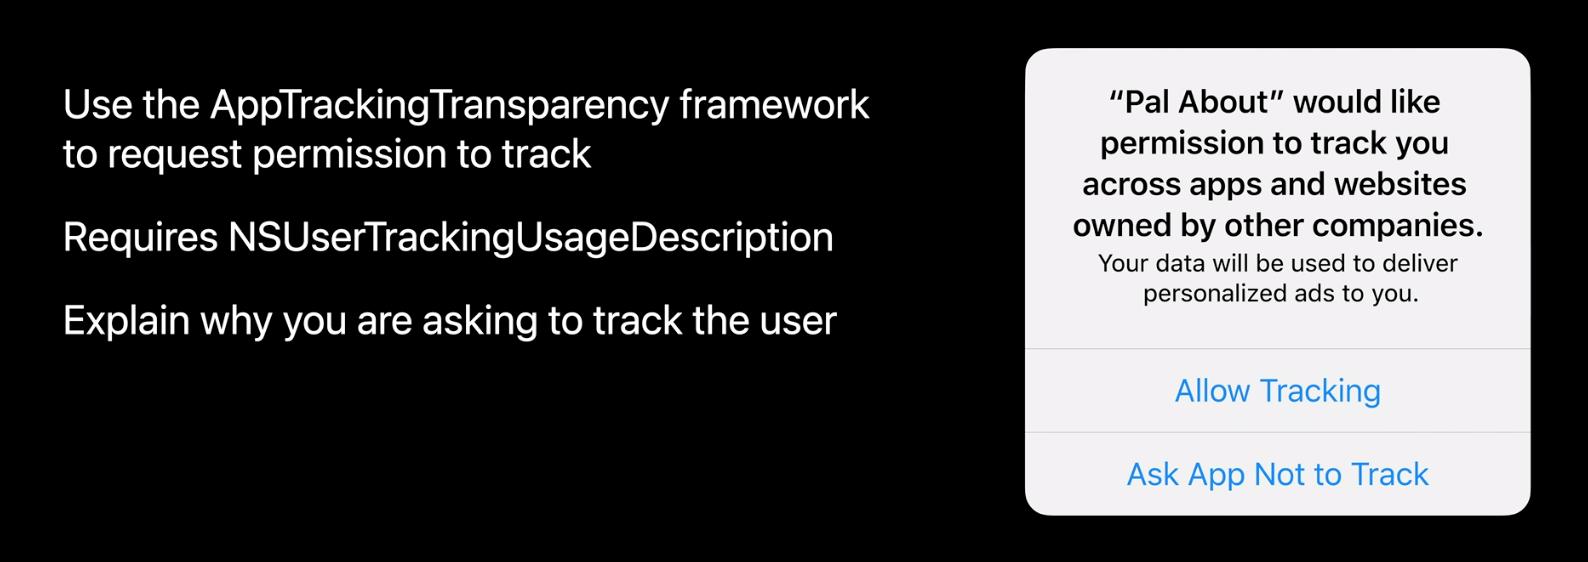 AppTrackingTransparency Framework iOS 14 (iOS IDFA pop up flow)